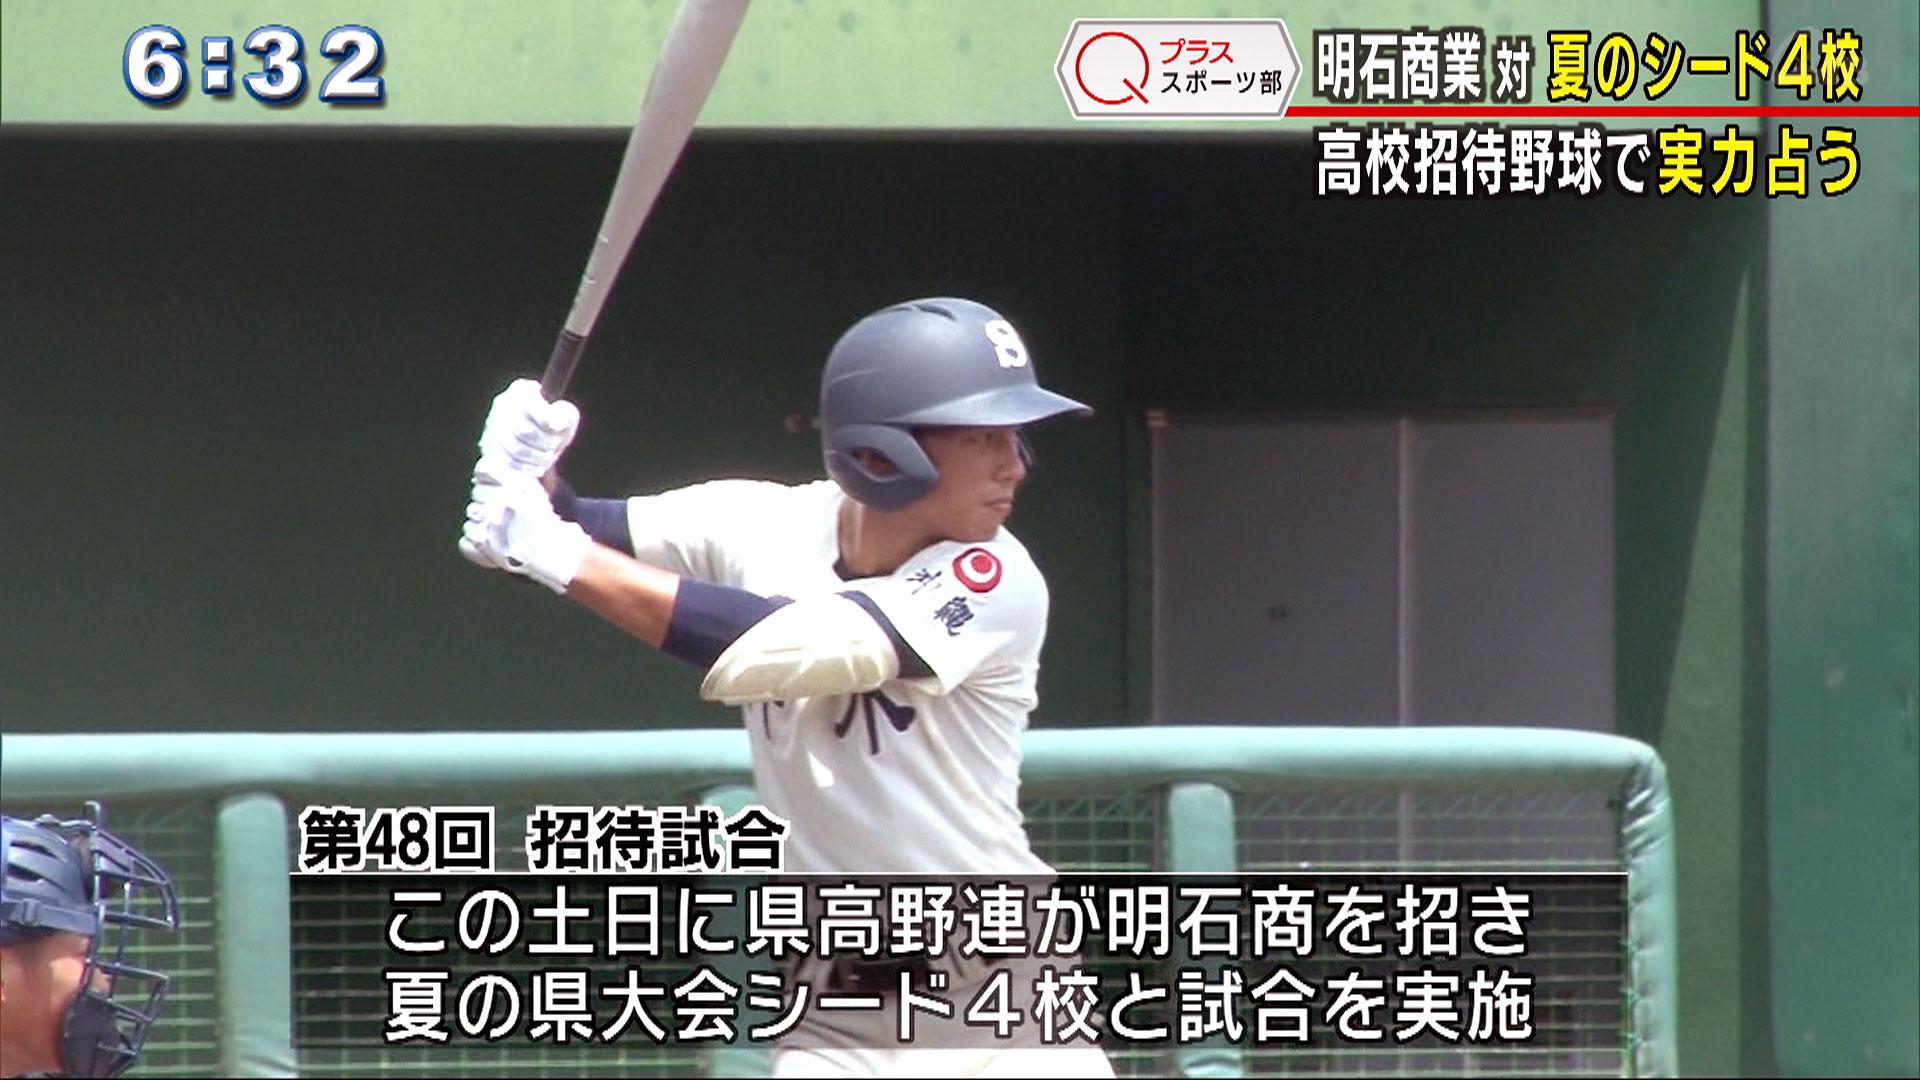 Qプラススポーツ部 県高校招待野球 県勢 明石商業に挑む